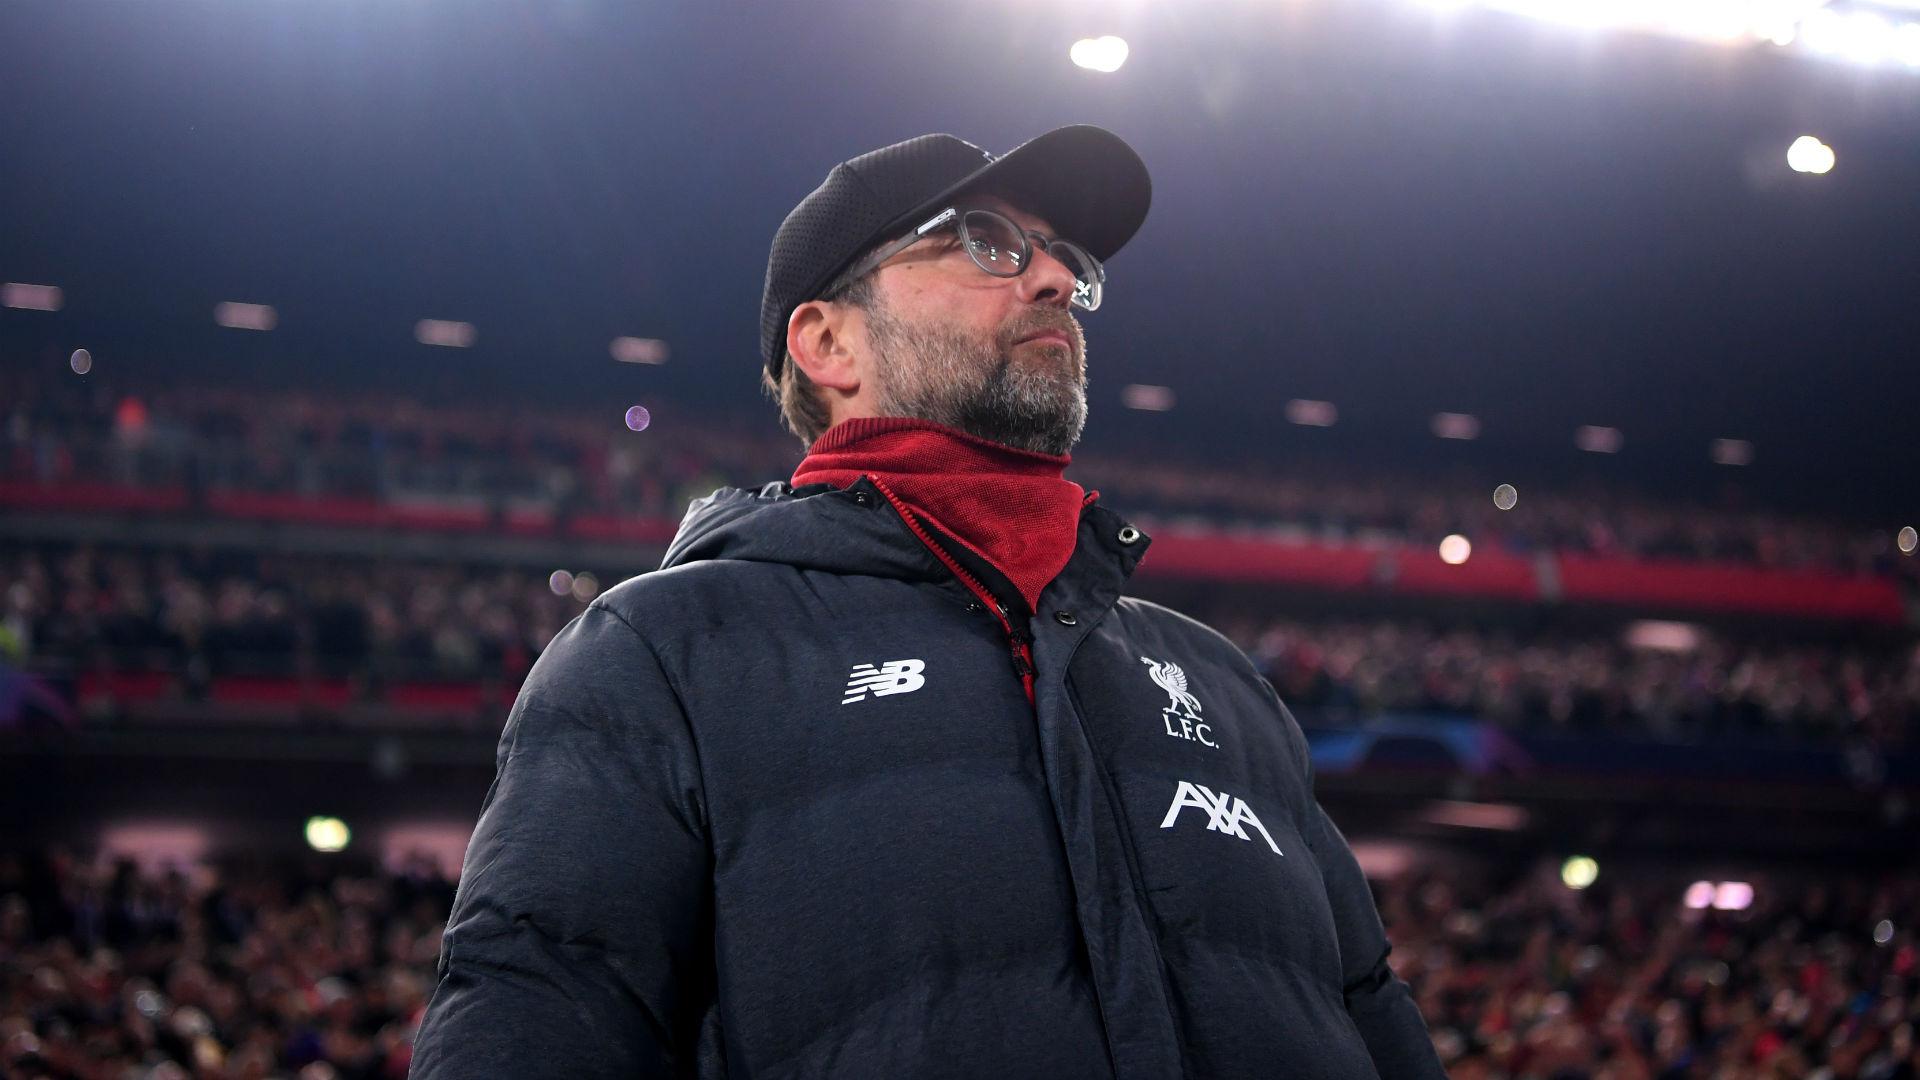 Liverpool v Manchester City: Opportunity knocks again for Jurgen Klopp and his relentless Reds